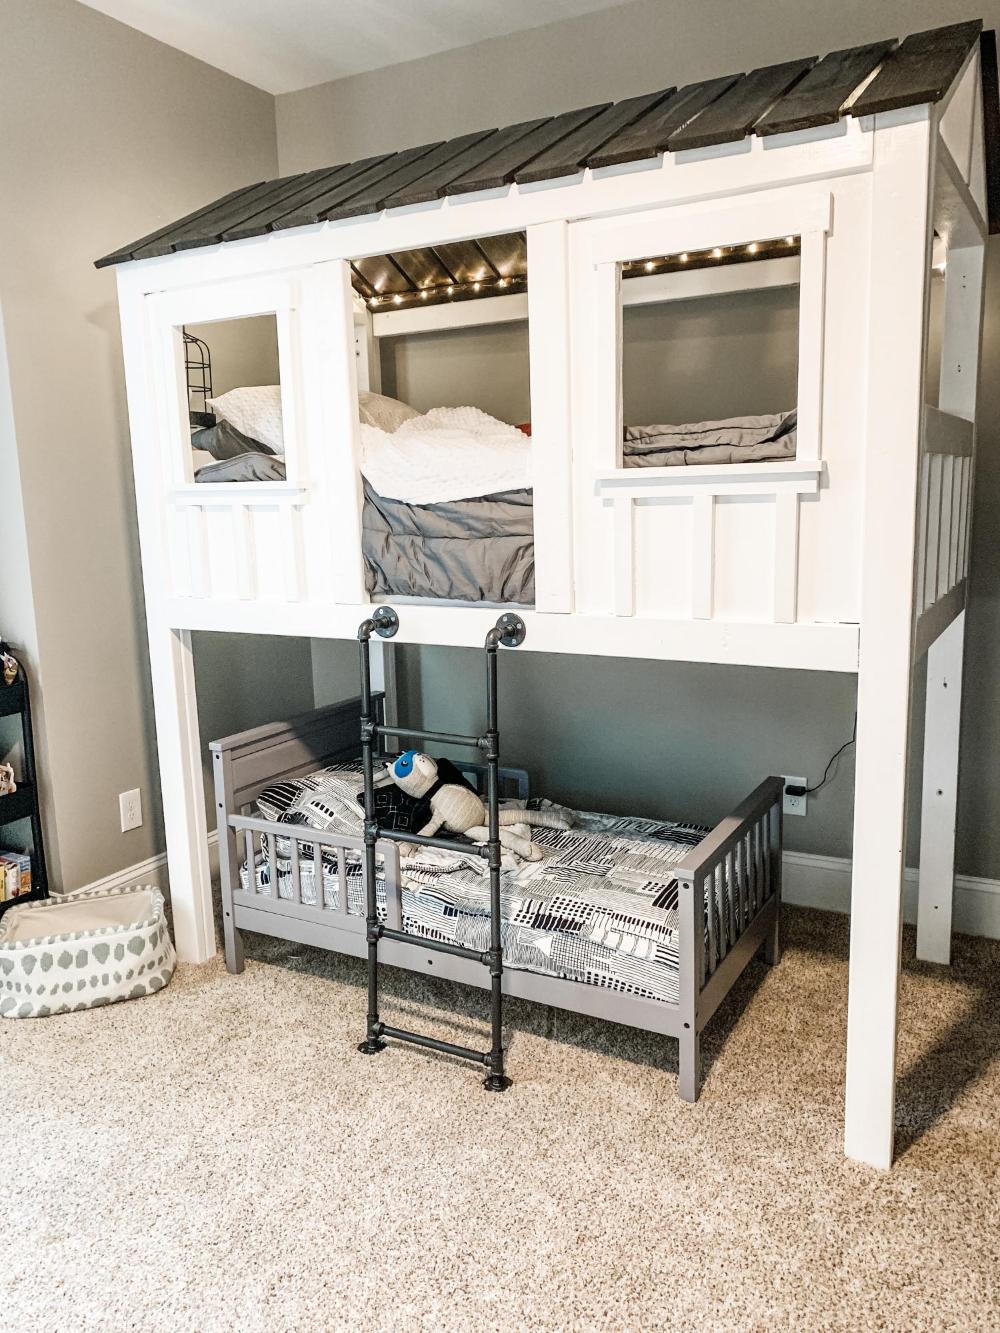 Cabin loft bunk bed Ana White in 2020 Loft bunk beds